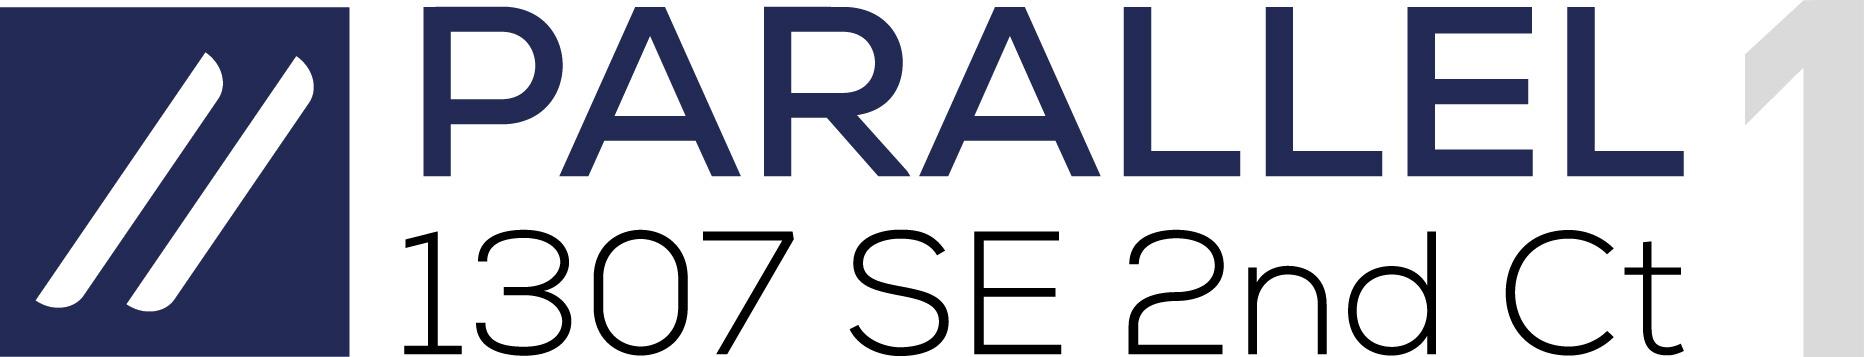 Parallel-1-logo